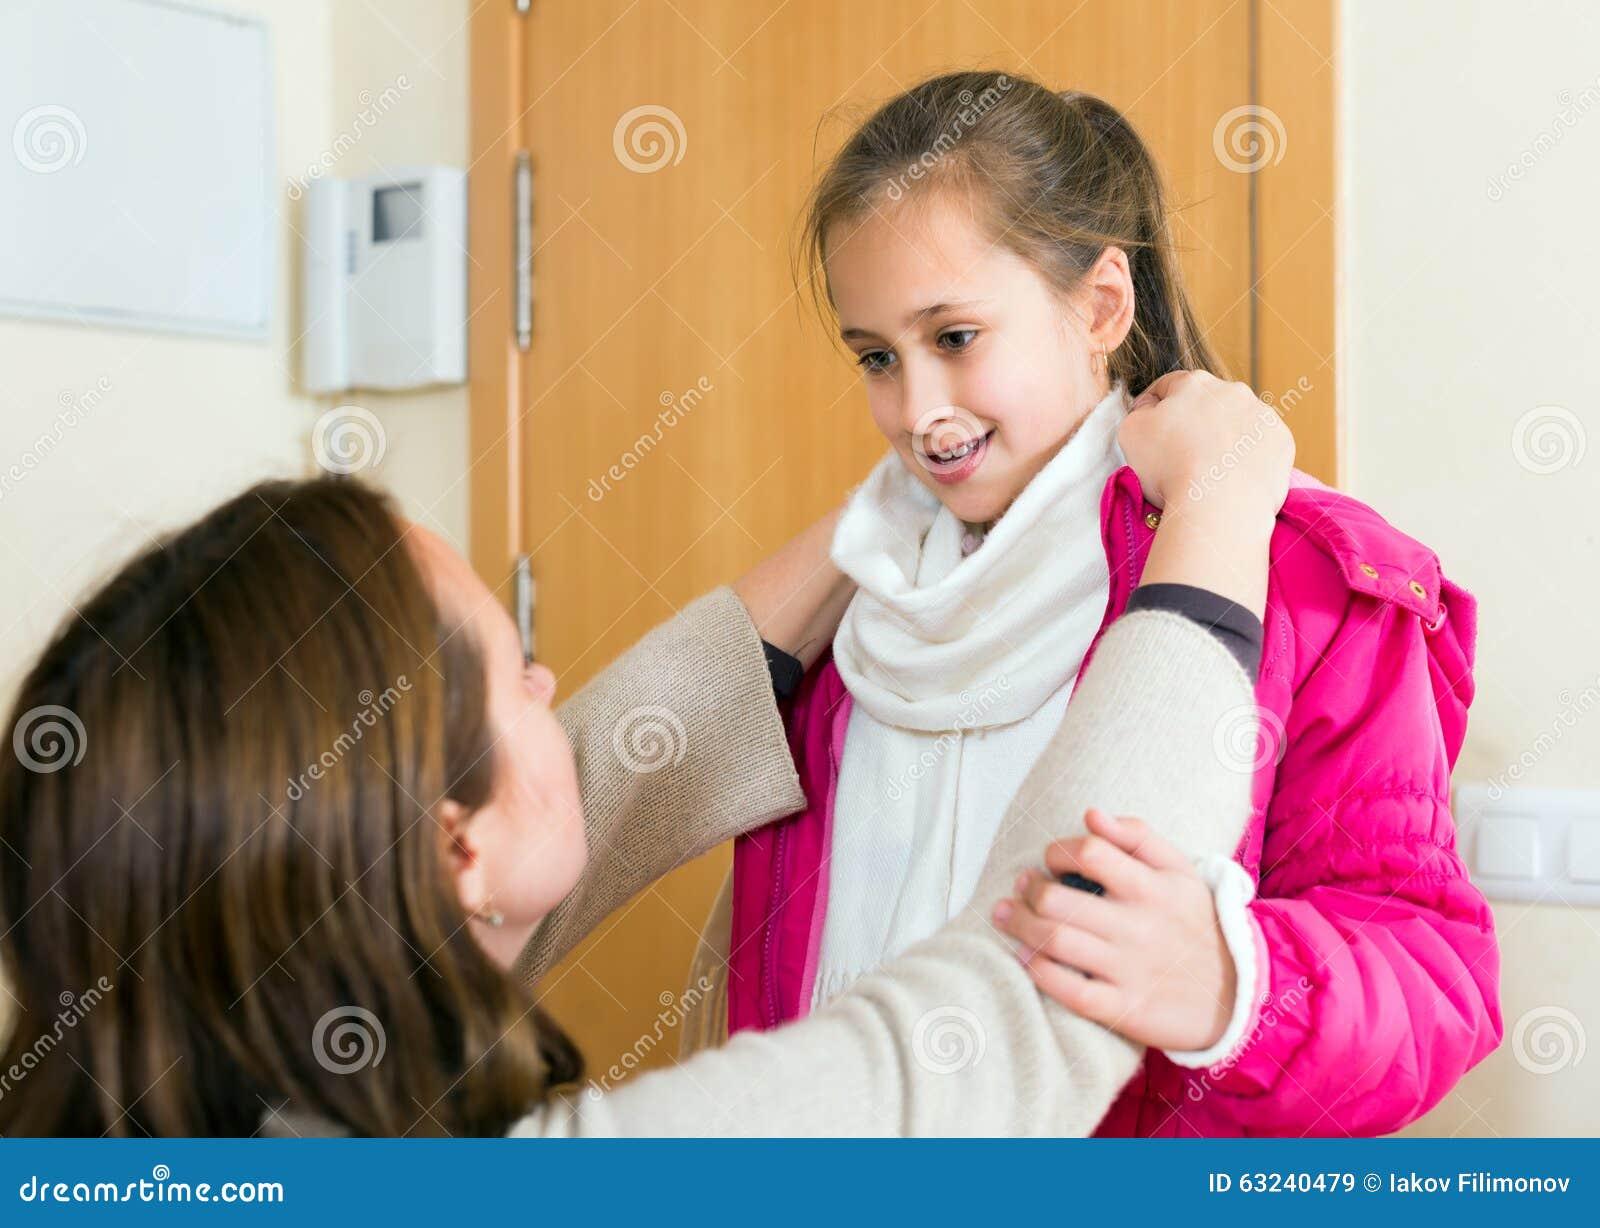 Mom helps daughter green